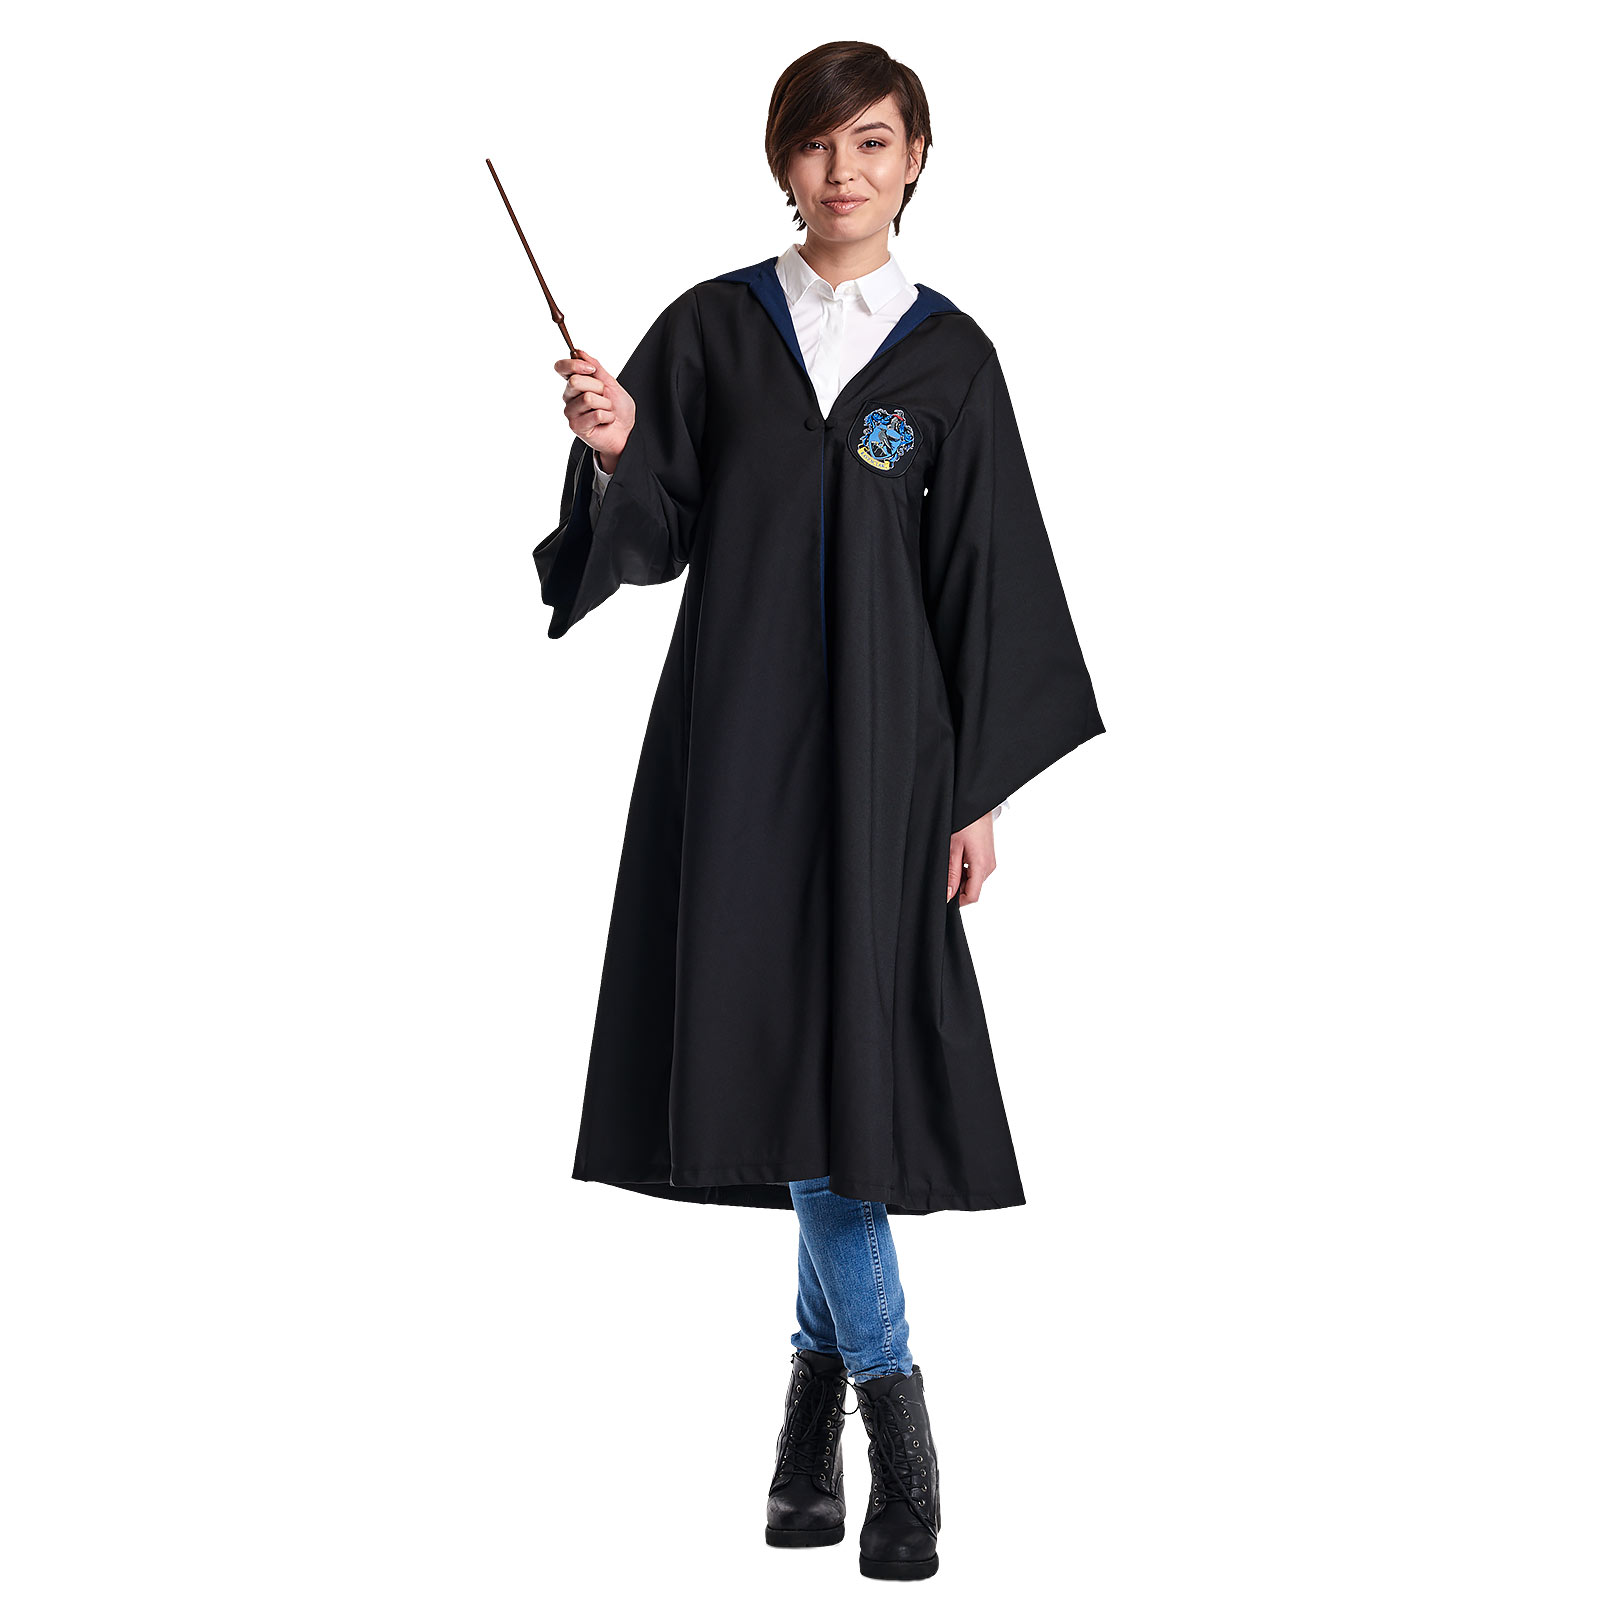 Harry Potter - Ravenclaw Zauberergewand